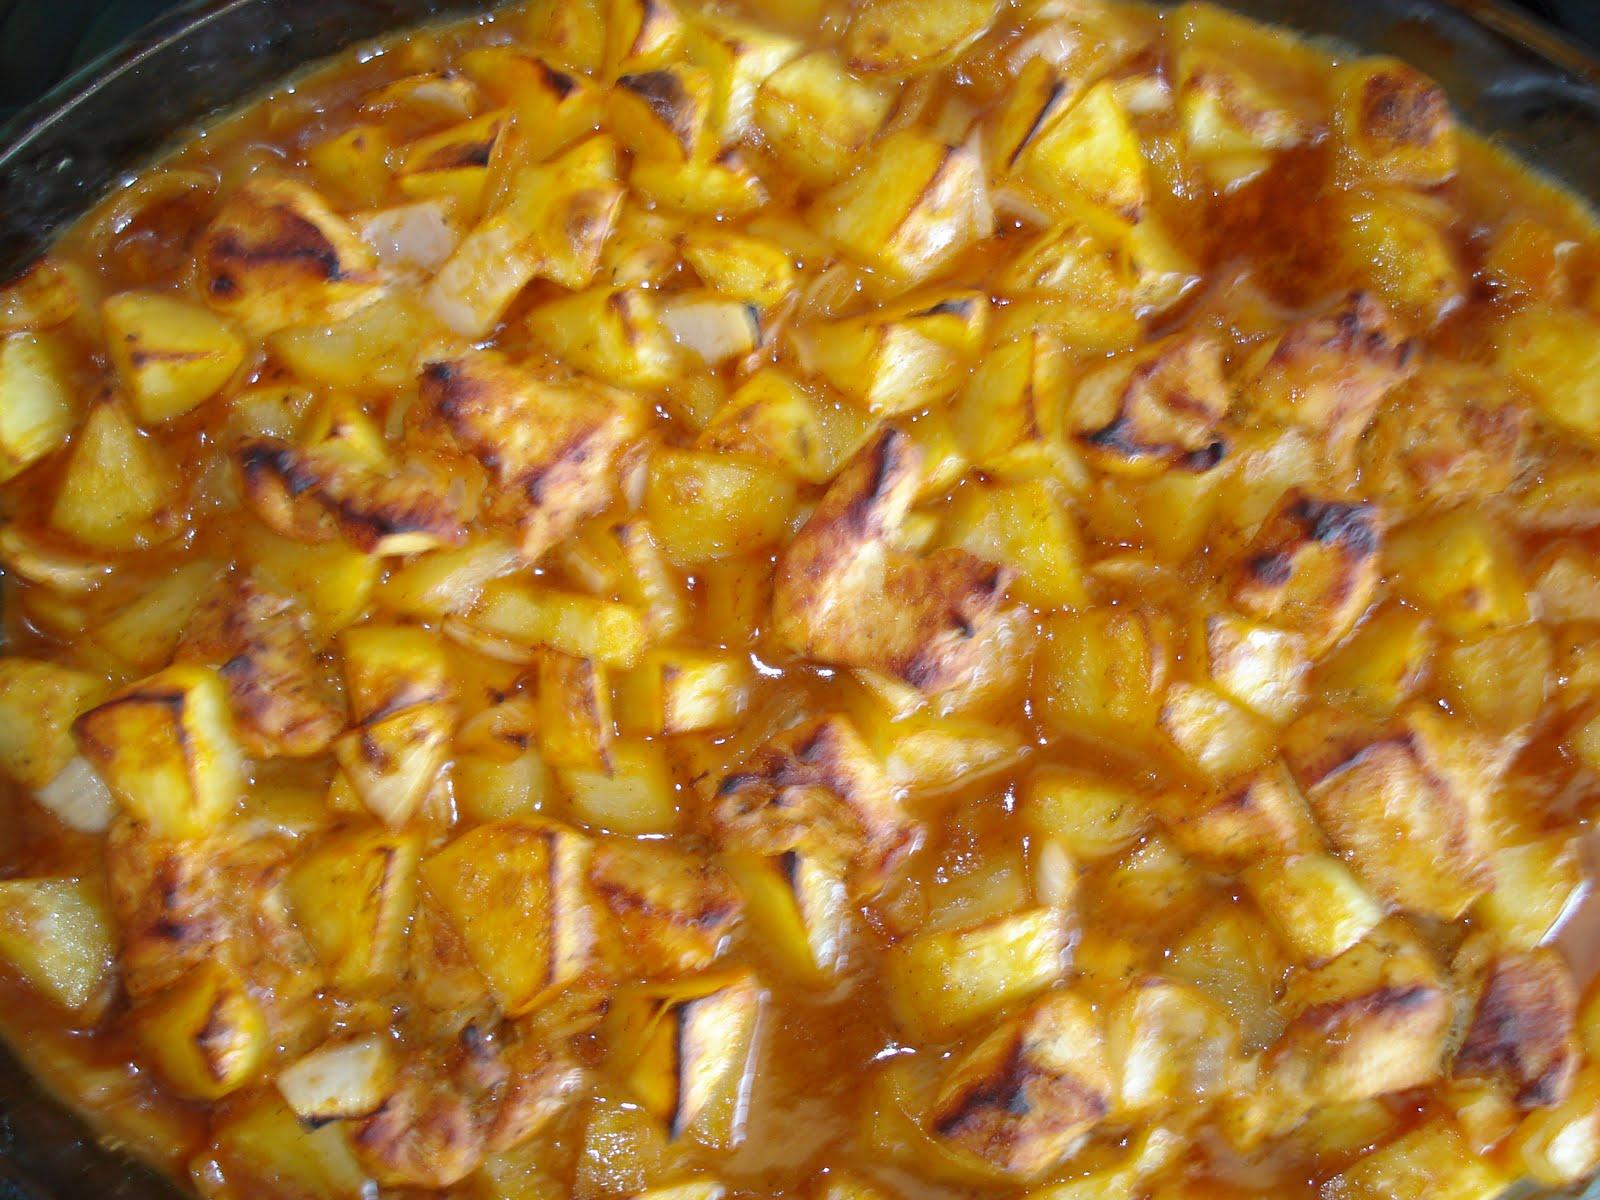 Mi cocina de recetas variadas pollo asado a la barbacoa - Pechugas de pollo al horno con patatas ...